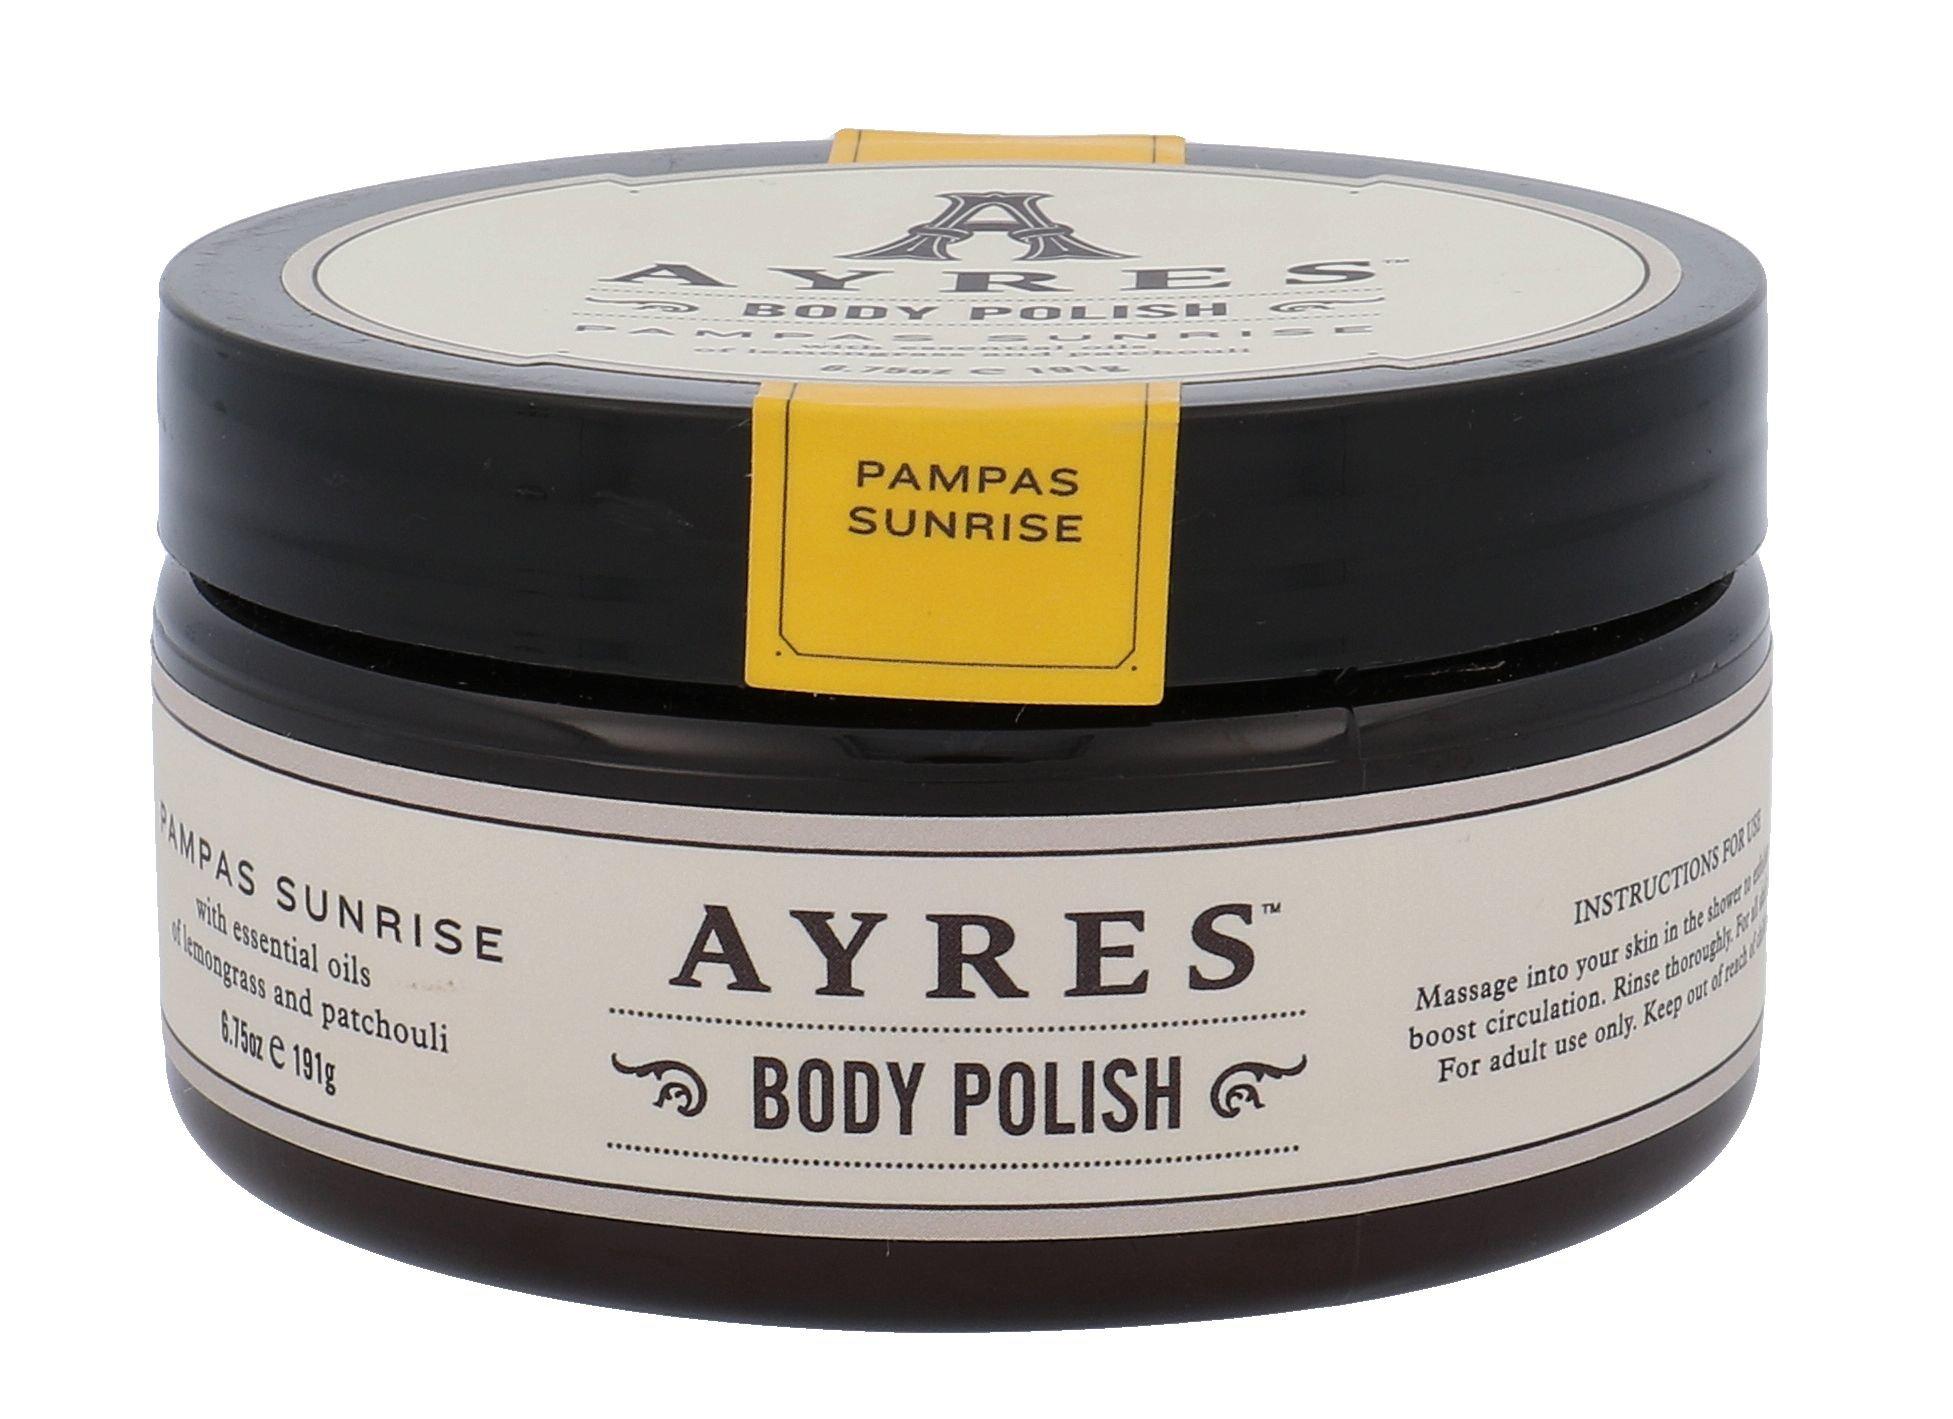 Ayres Pampas Sunrise Body Polish Cosmetic 191g